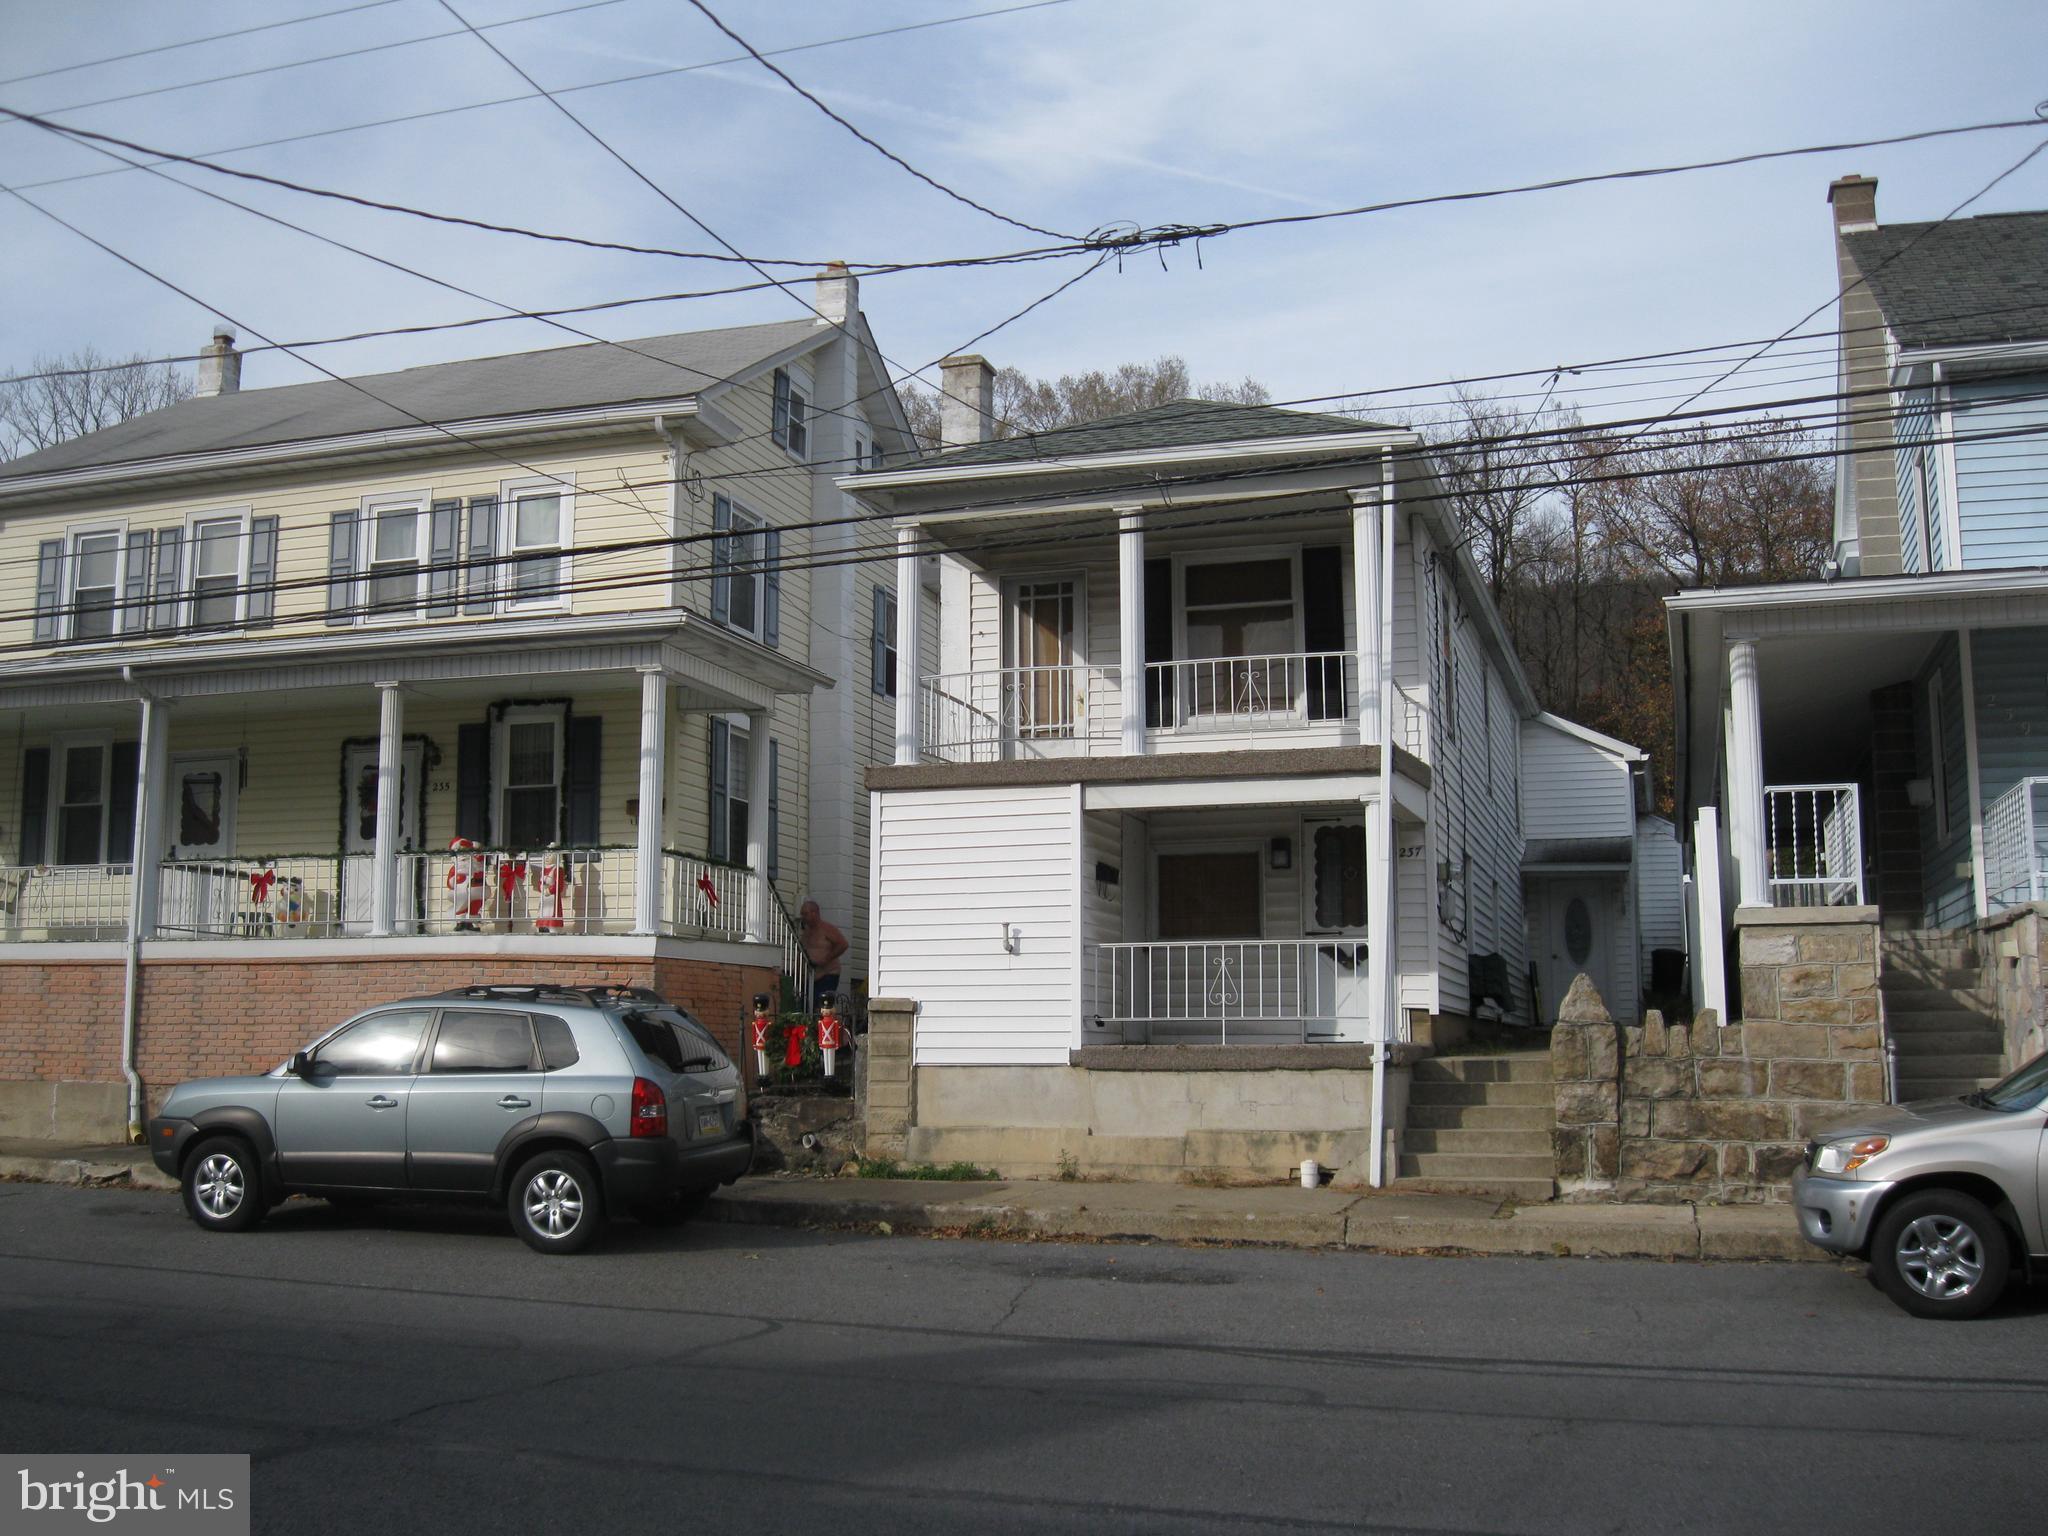 237 E BROAD STREET, WILLIAMSTOWN, PA 17098